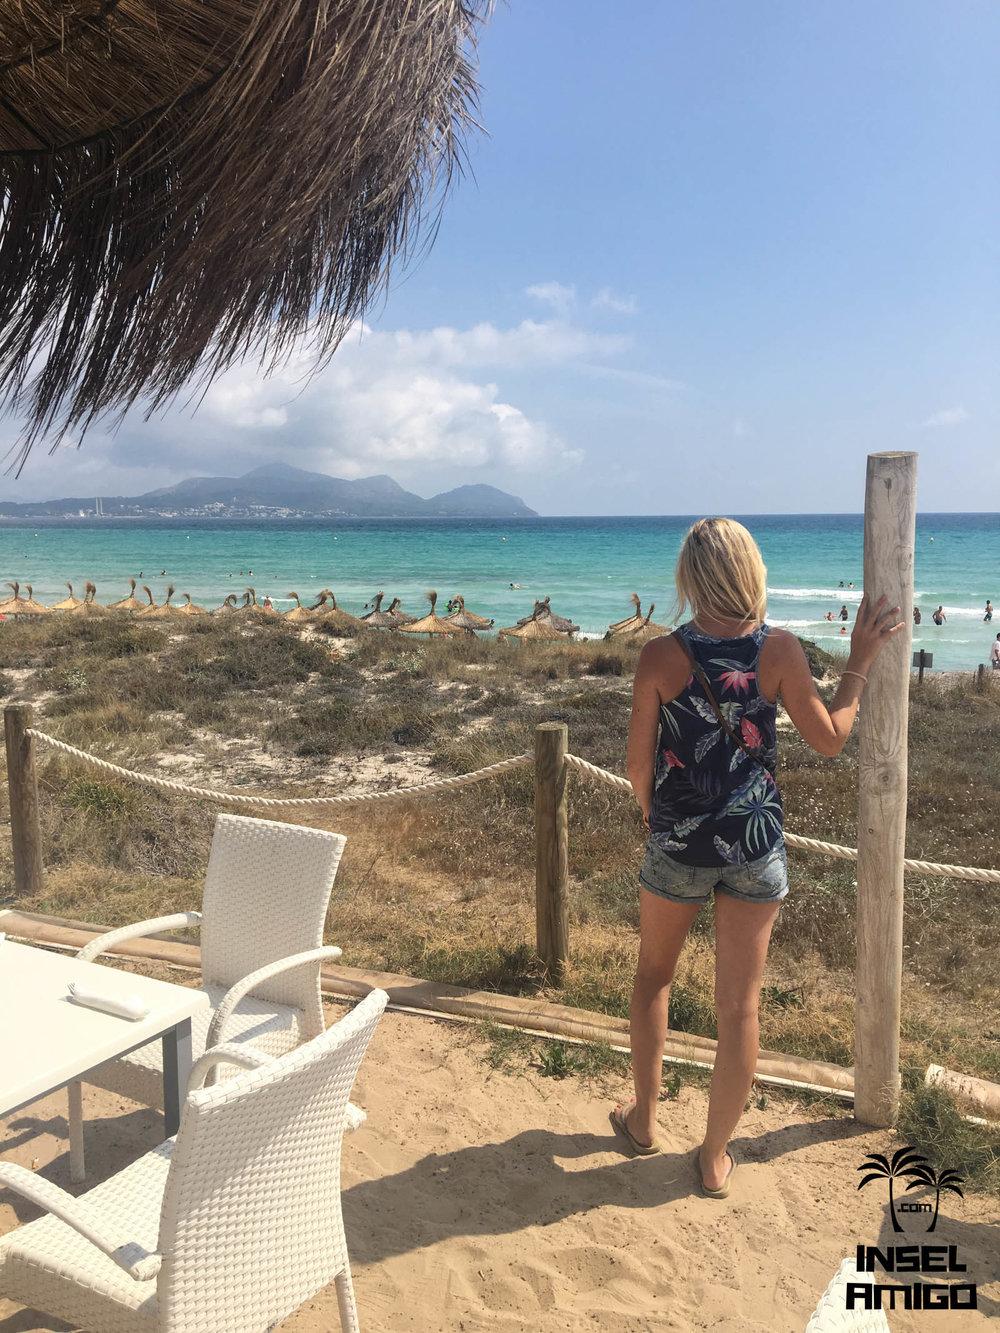 Traumstrand Playa de Muro